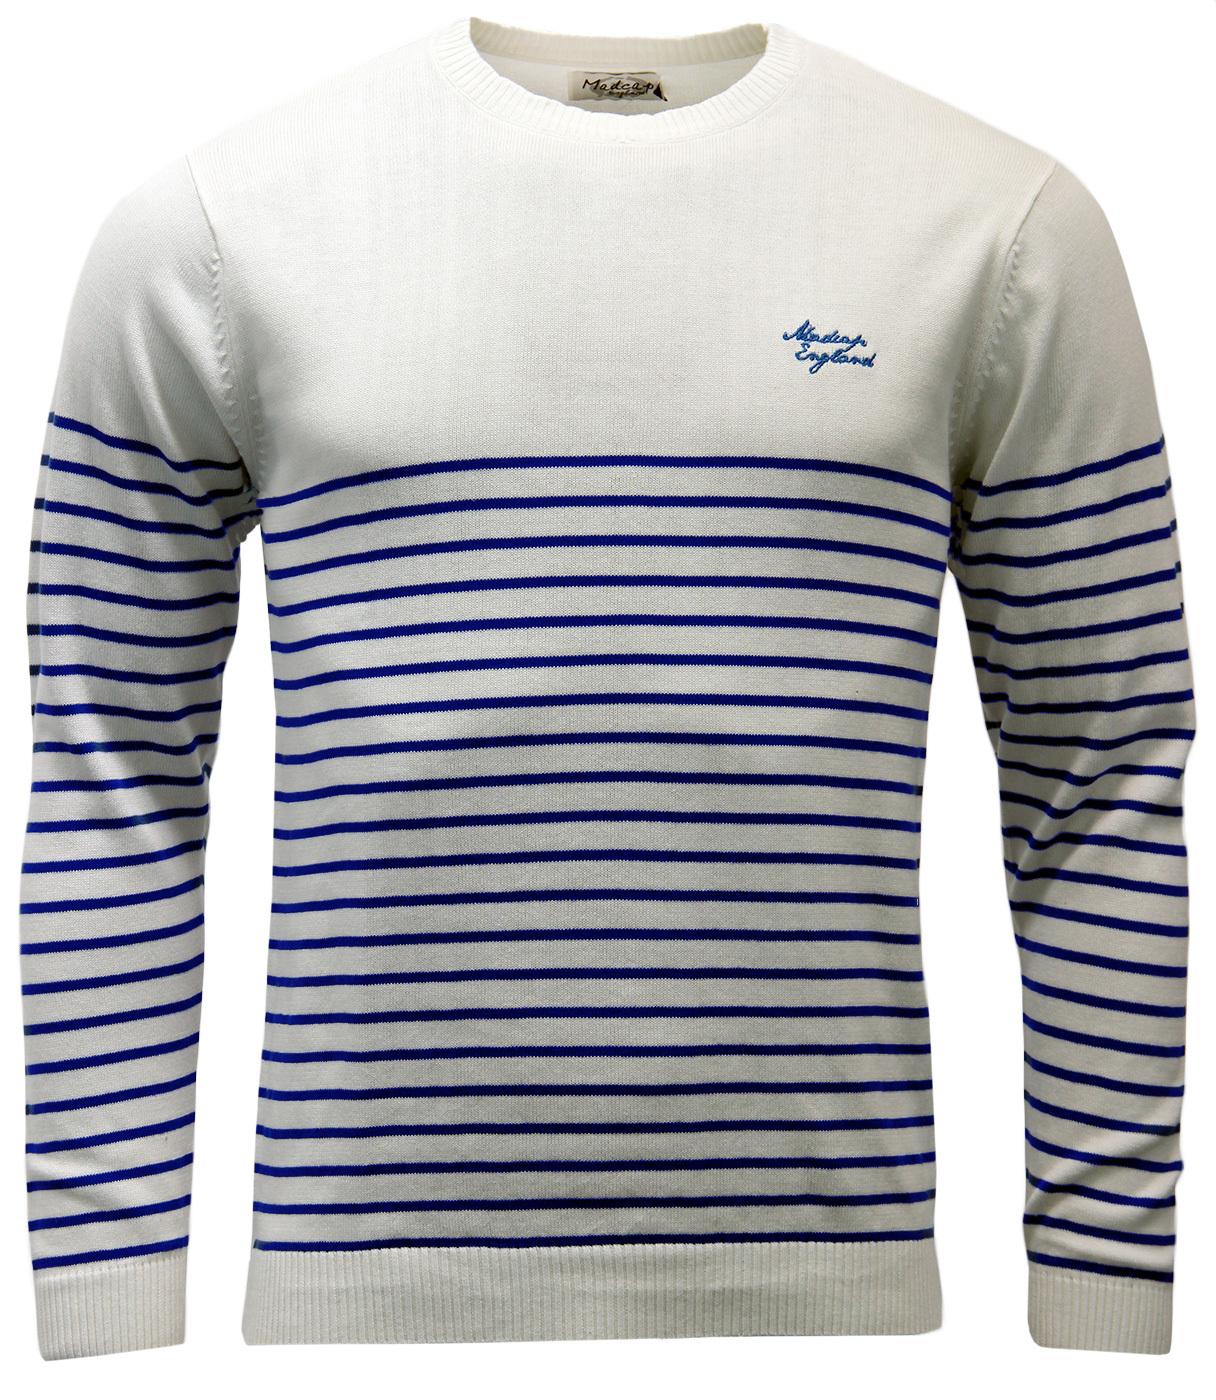 'Bobby' - Retro 60s Breton Stripe Mod Jumper (W)